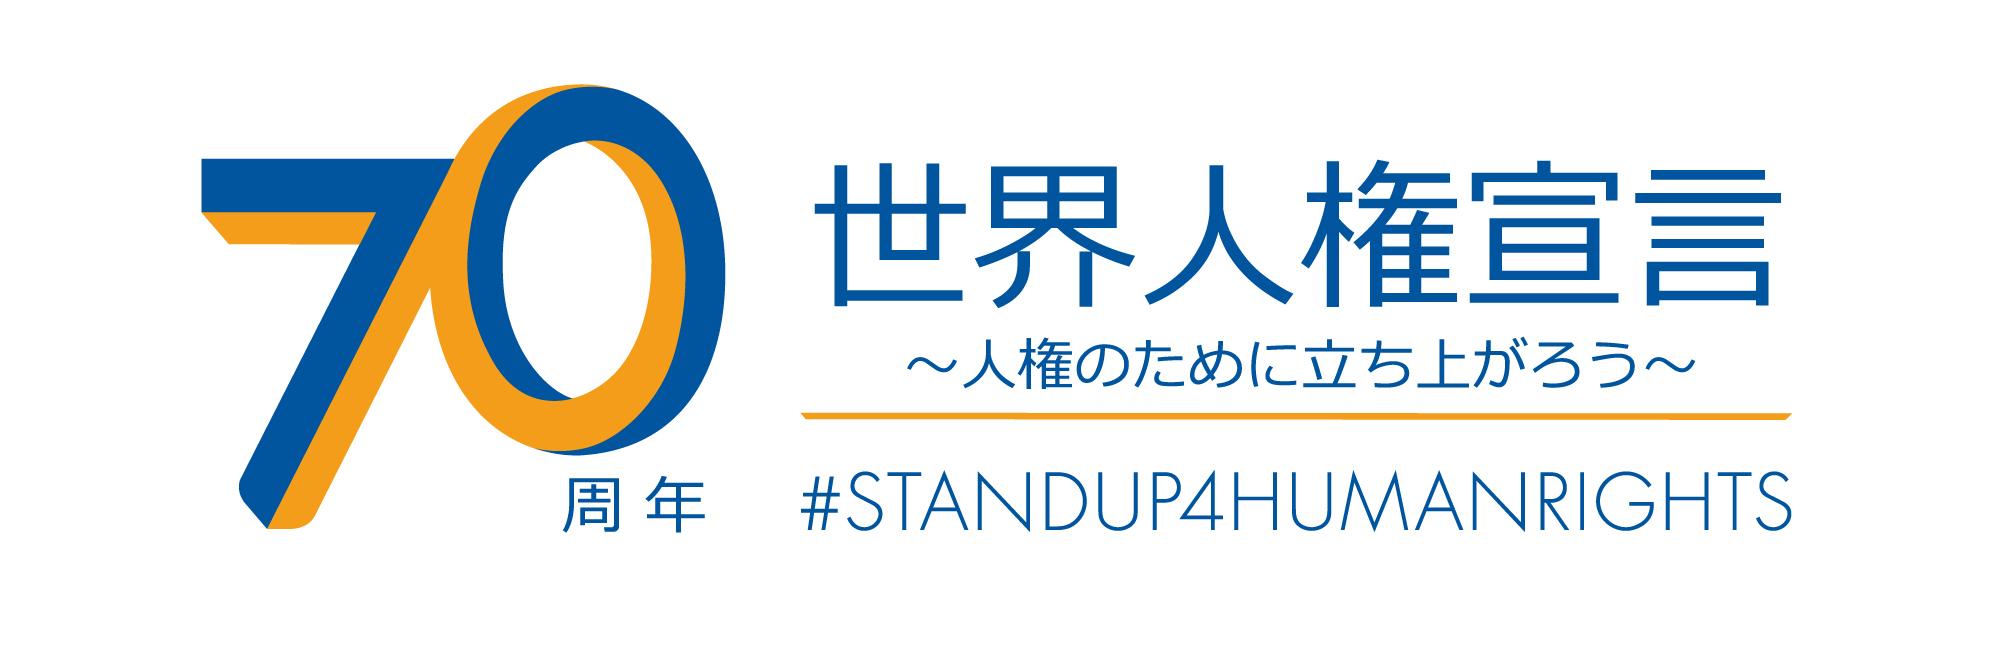 #STANDUP4HUMANRIGTS